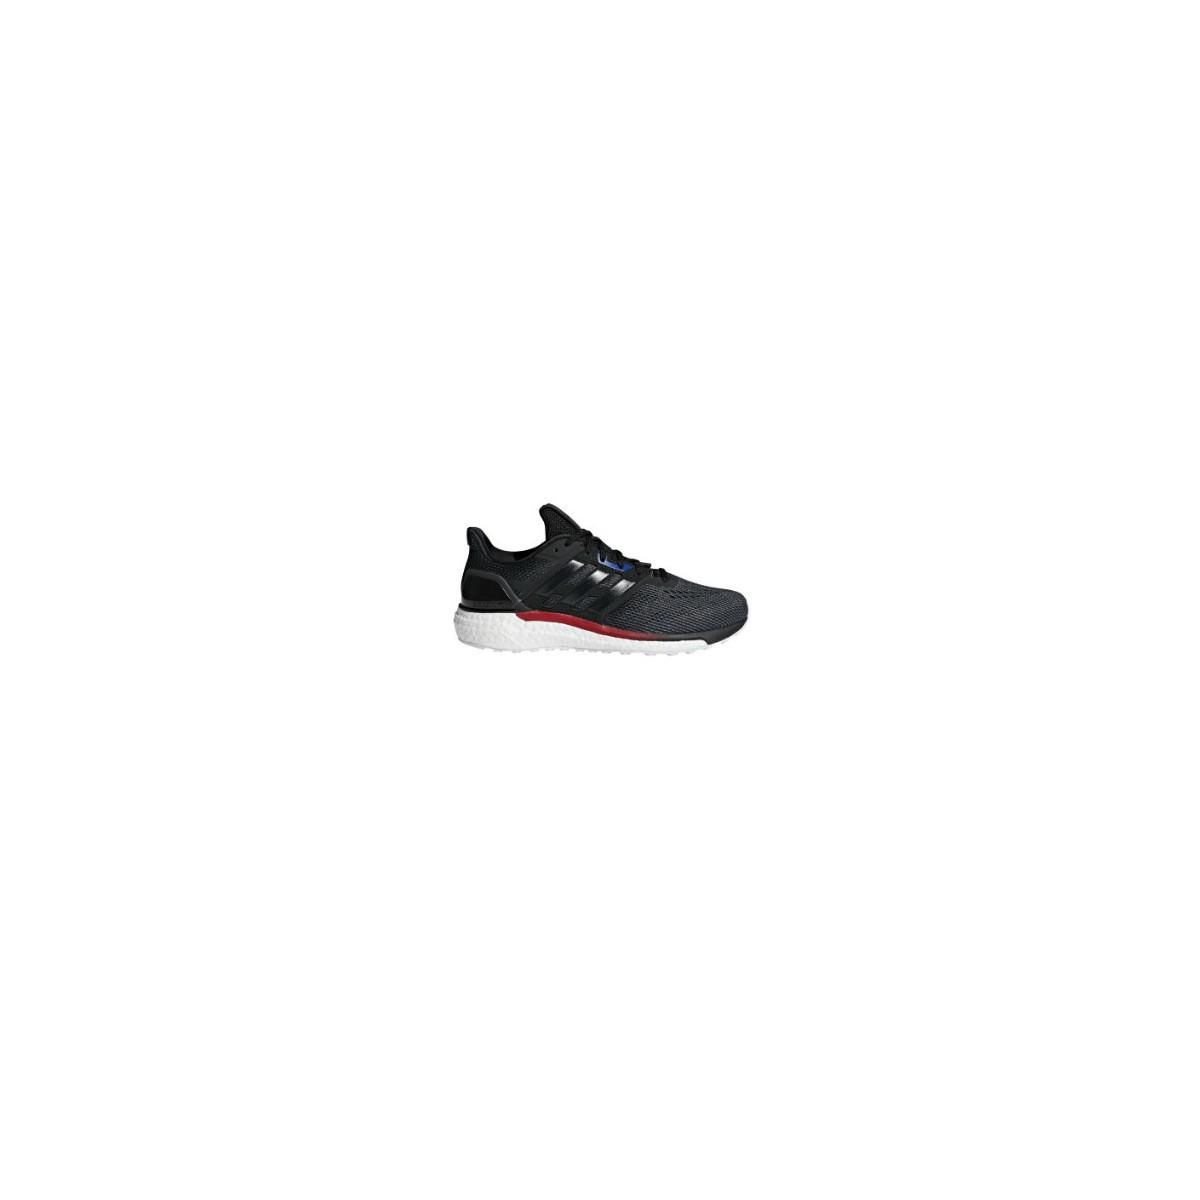 aade21fde Adidas Supernova Aktiv. Color negro - 365 Rider